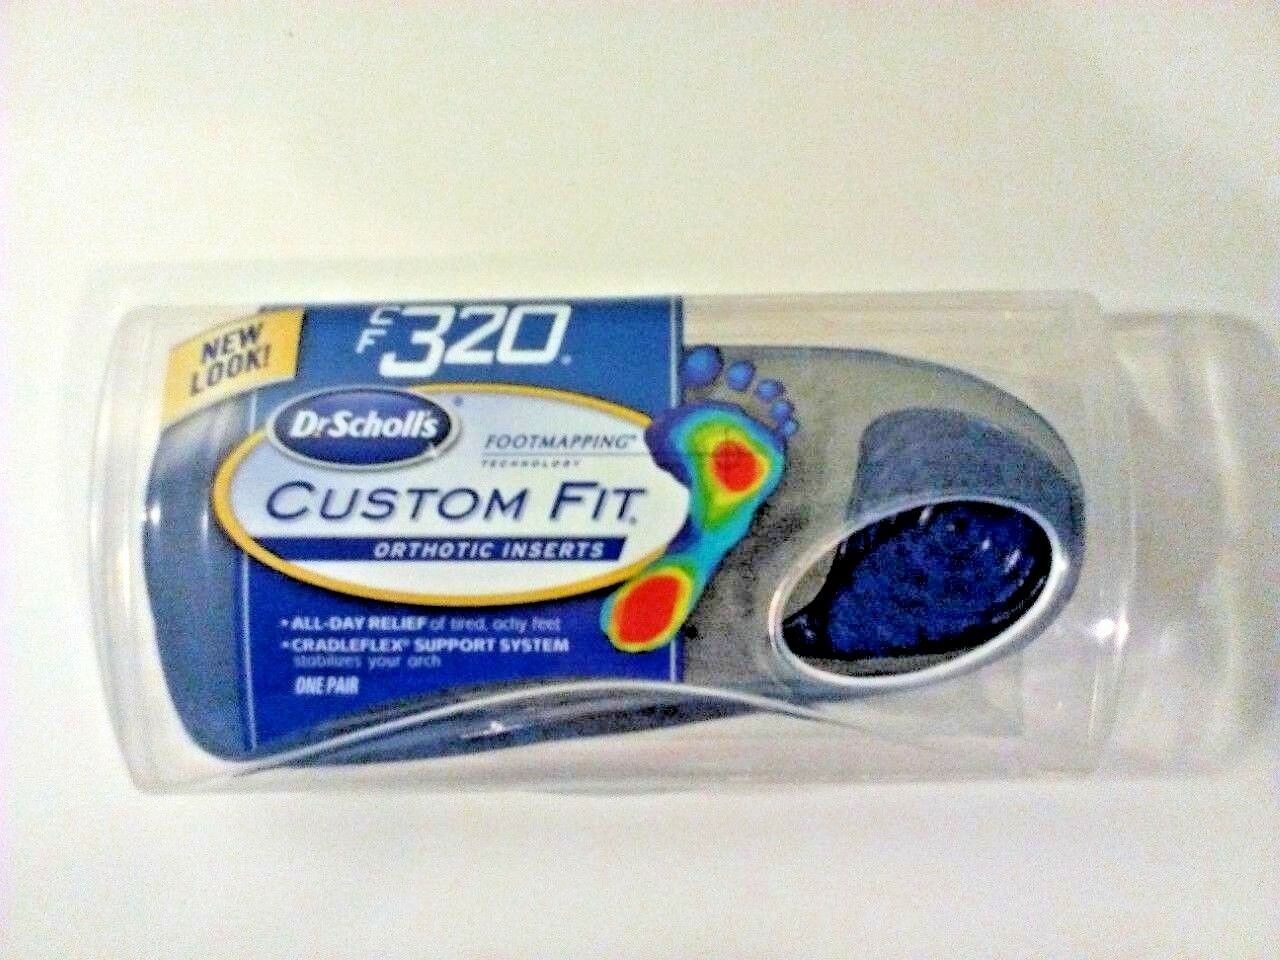 Dr. Scholls Custom Fit Orthotic Inserts, Cf 320